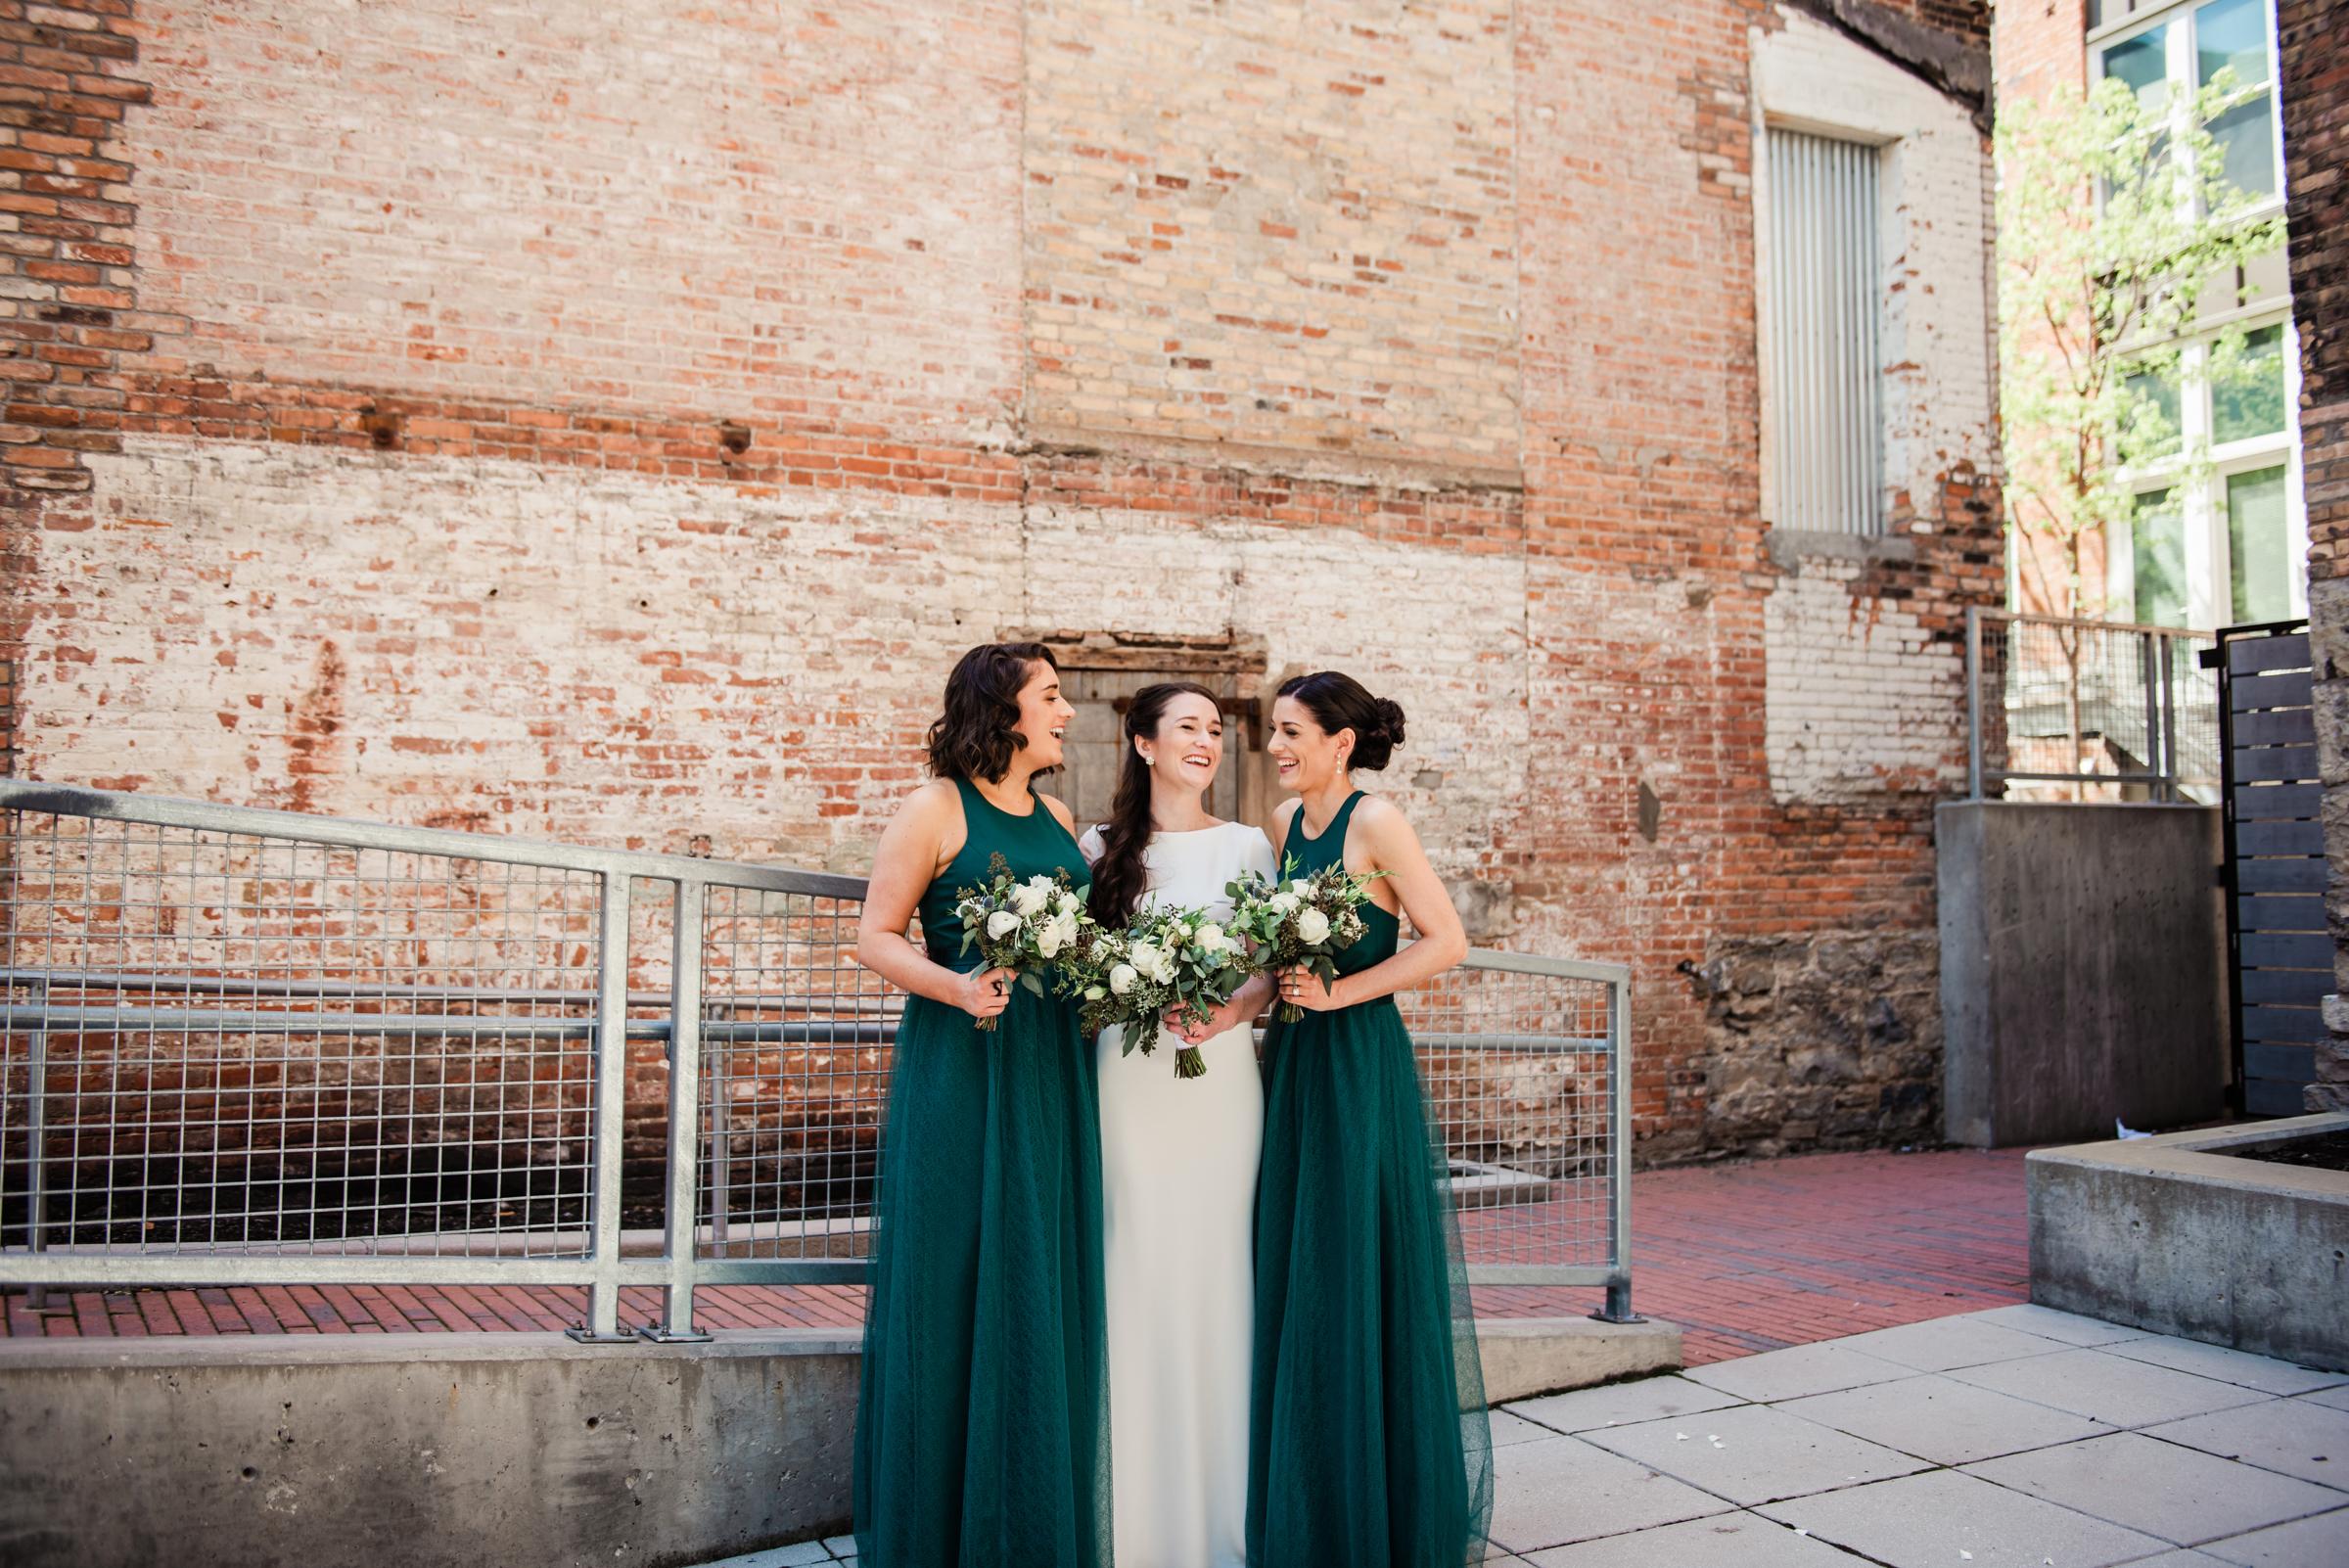 SKY_Armory_Syracuse_Wedding_JILL_STUDIO_Rochester_NY_Photographer_DSC_5478.jpg